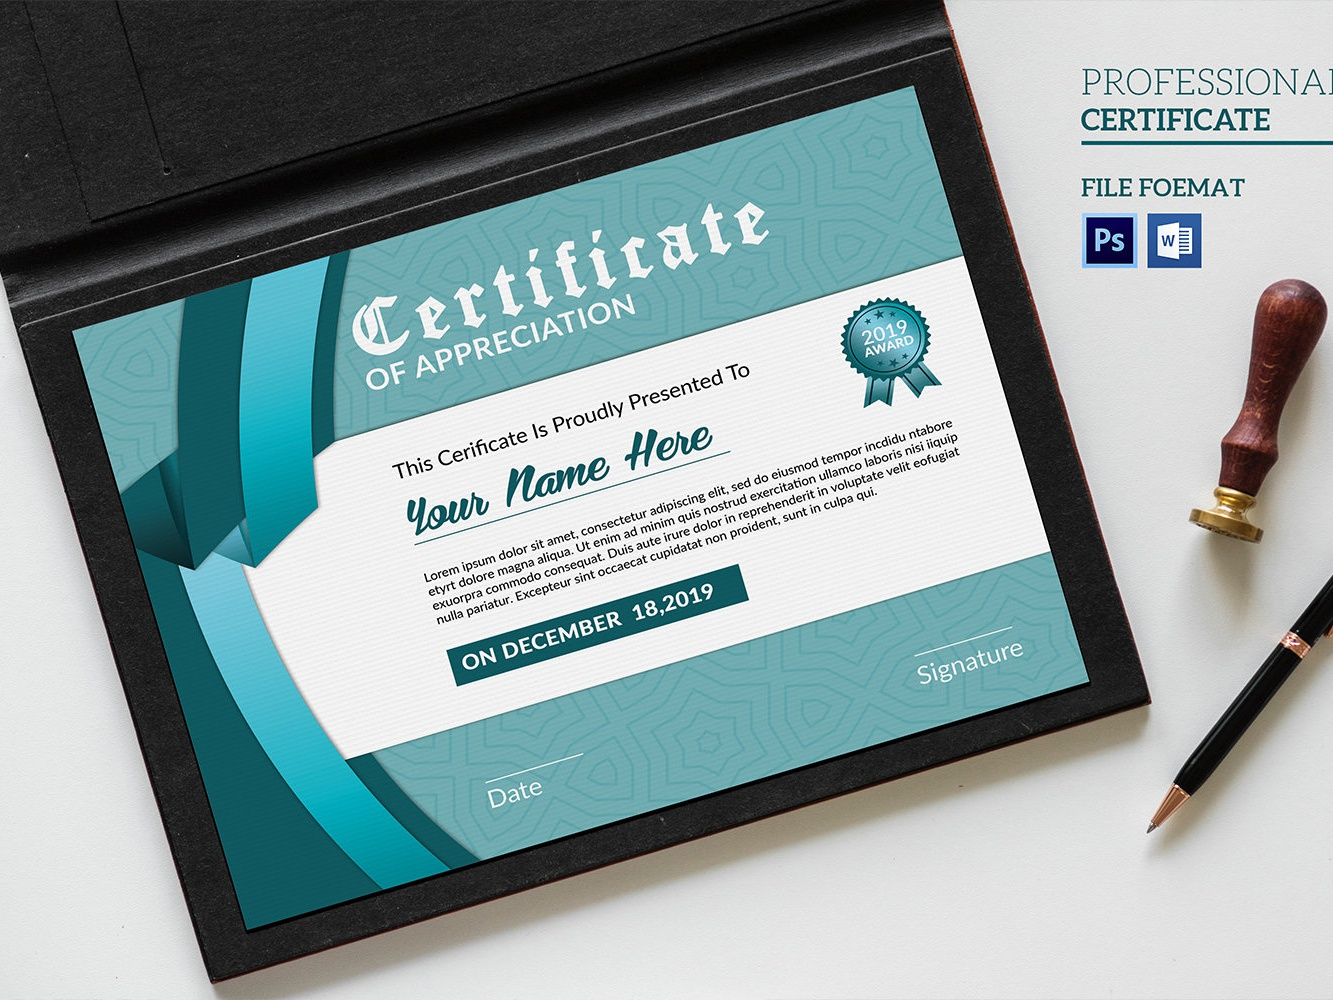 Certificate Template graduation elegant diploma collage certificate certificate design creative printable award appreciation modern certificate corporate certificate multipurpose certificate template